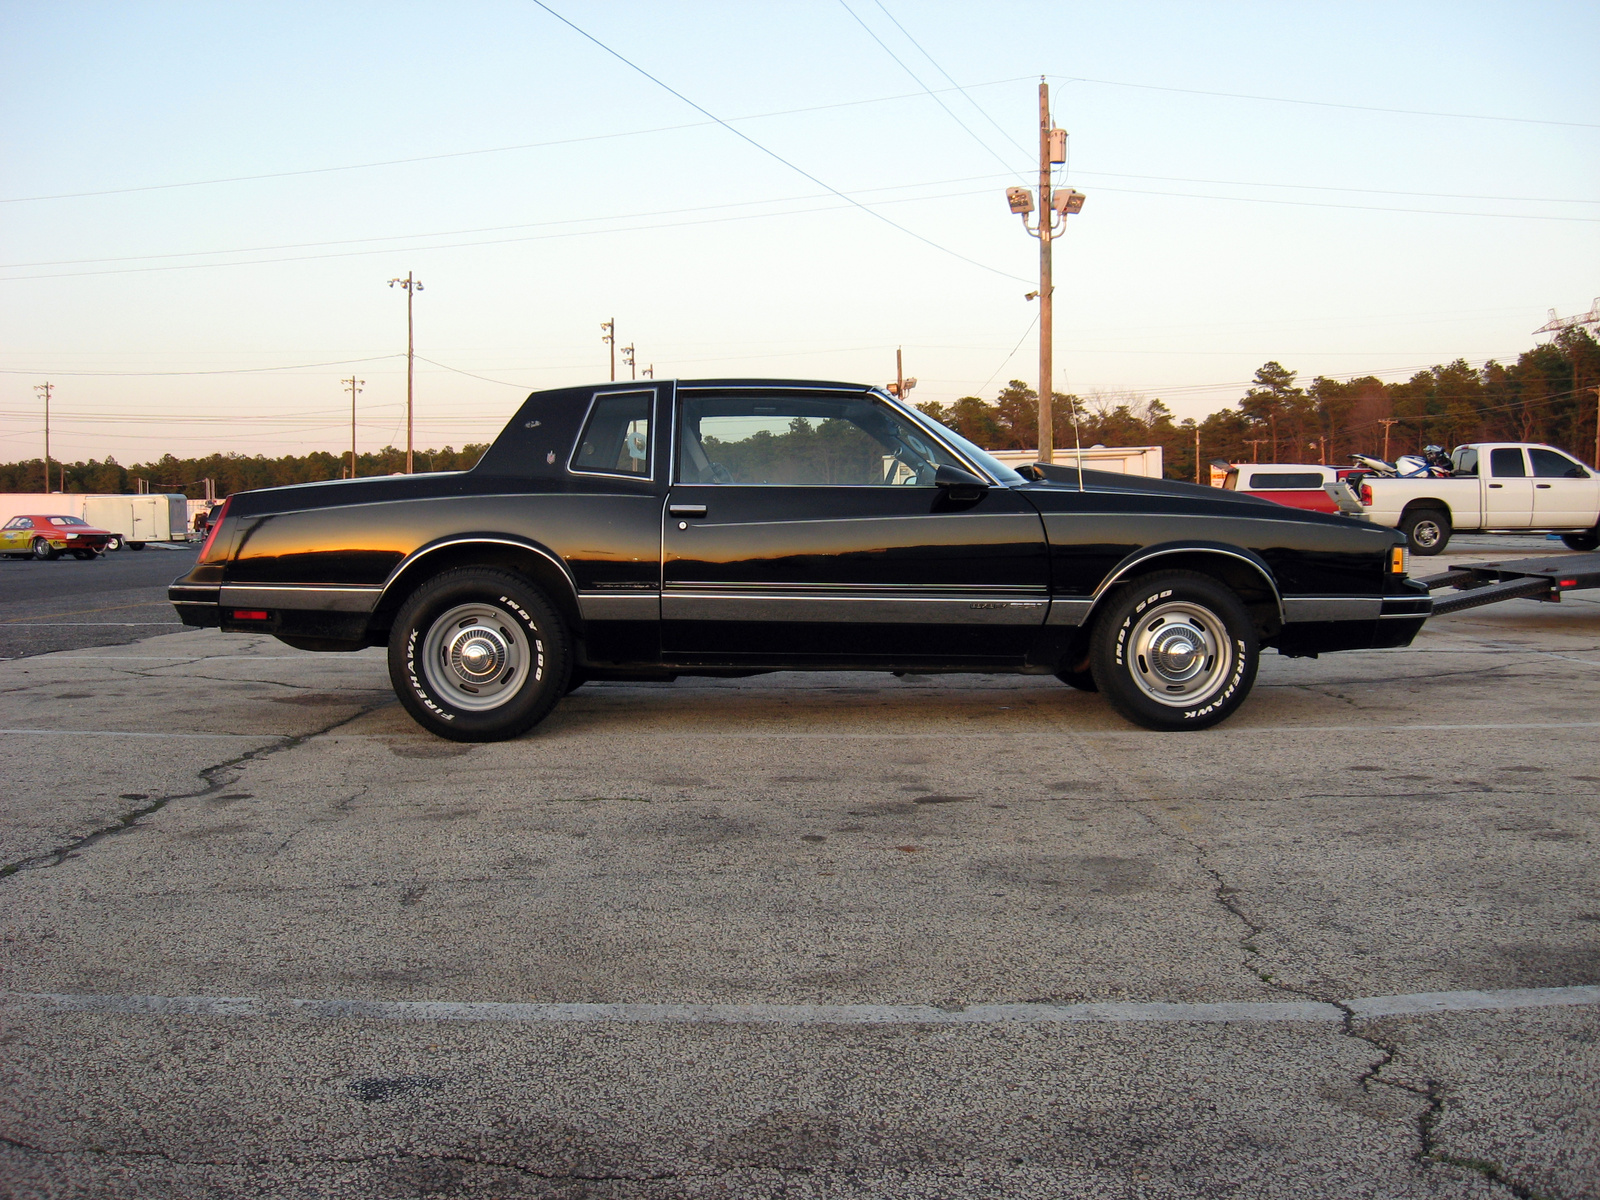 1988 Chevrolet Monte Carlo picture, exterior